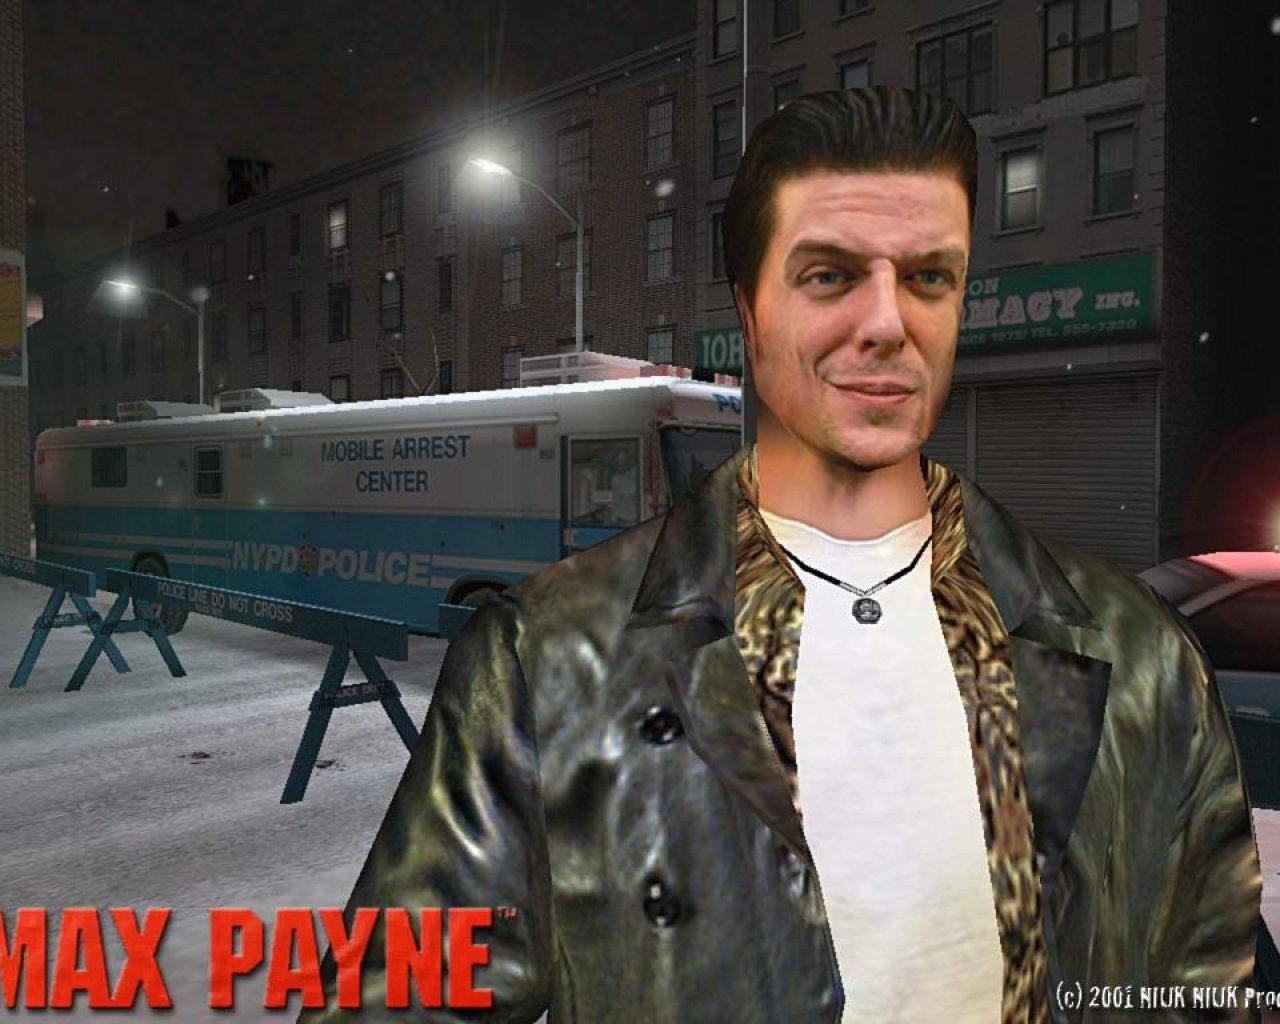 Max Payne Wallpapers Download Max Payne Wallpapers Max Payne